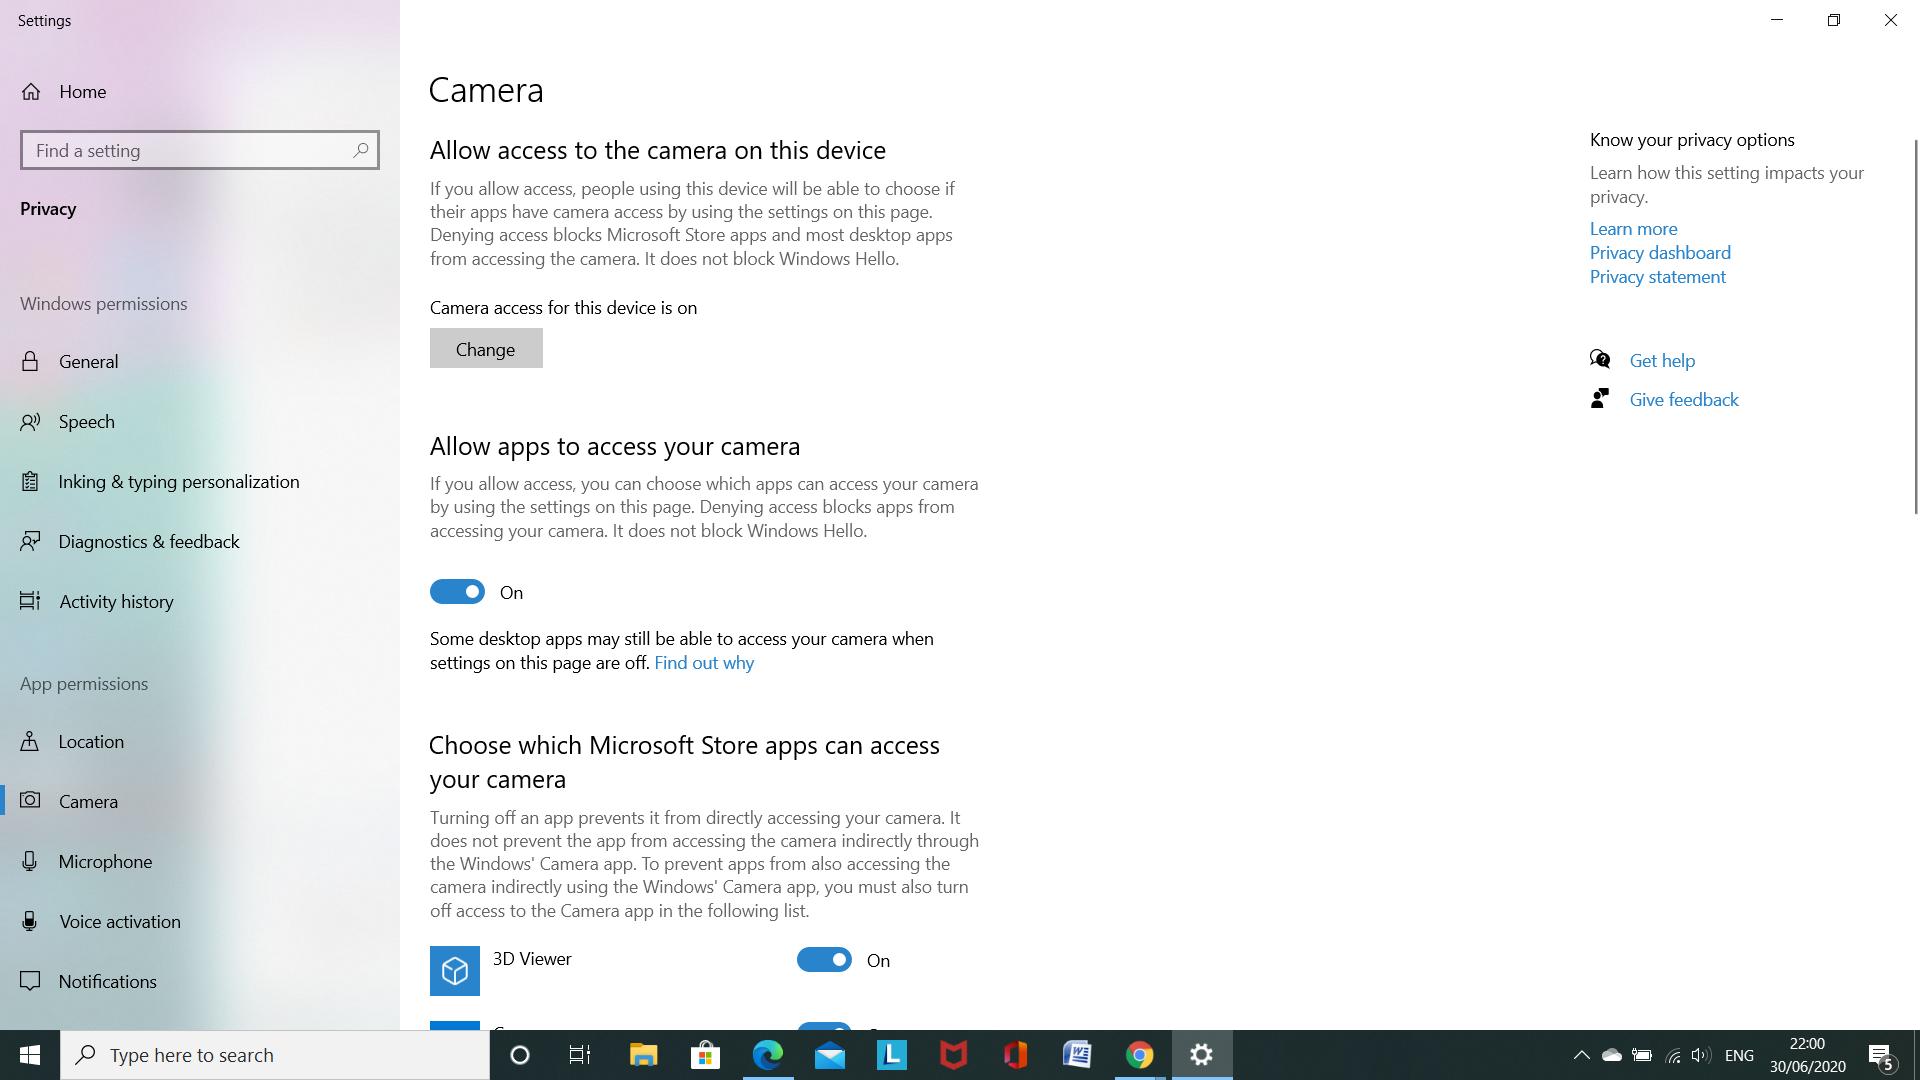 My camera is not working 26f25b4a-9dab-4b35-8f7f-d3e270431c72?upload=true.png